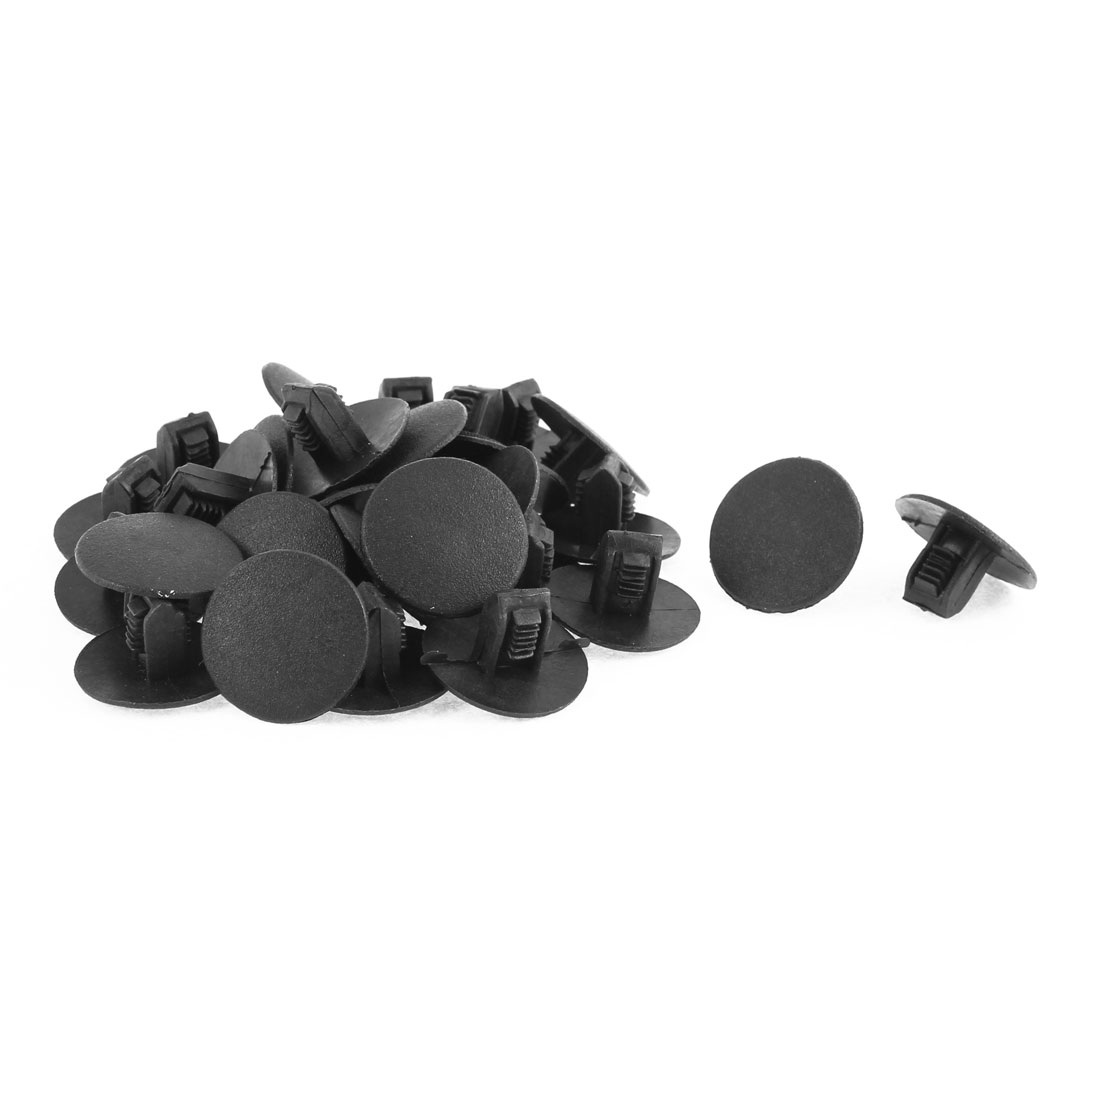 Plastic Splash Guard Defender Fastener Clips Black 9mm Hole 30Pcs